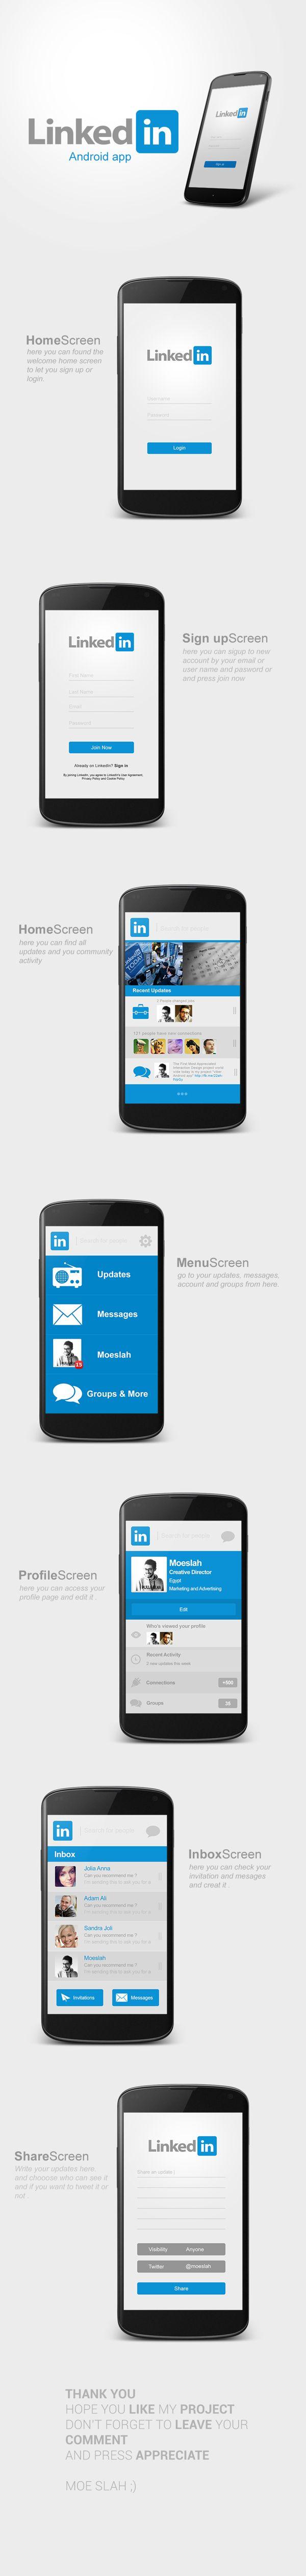 #LinkedIn #Android #App Re-design by Moe slah, via #Behance